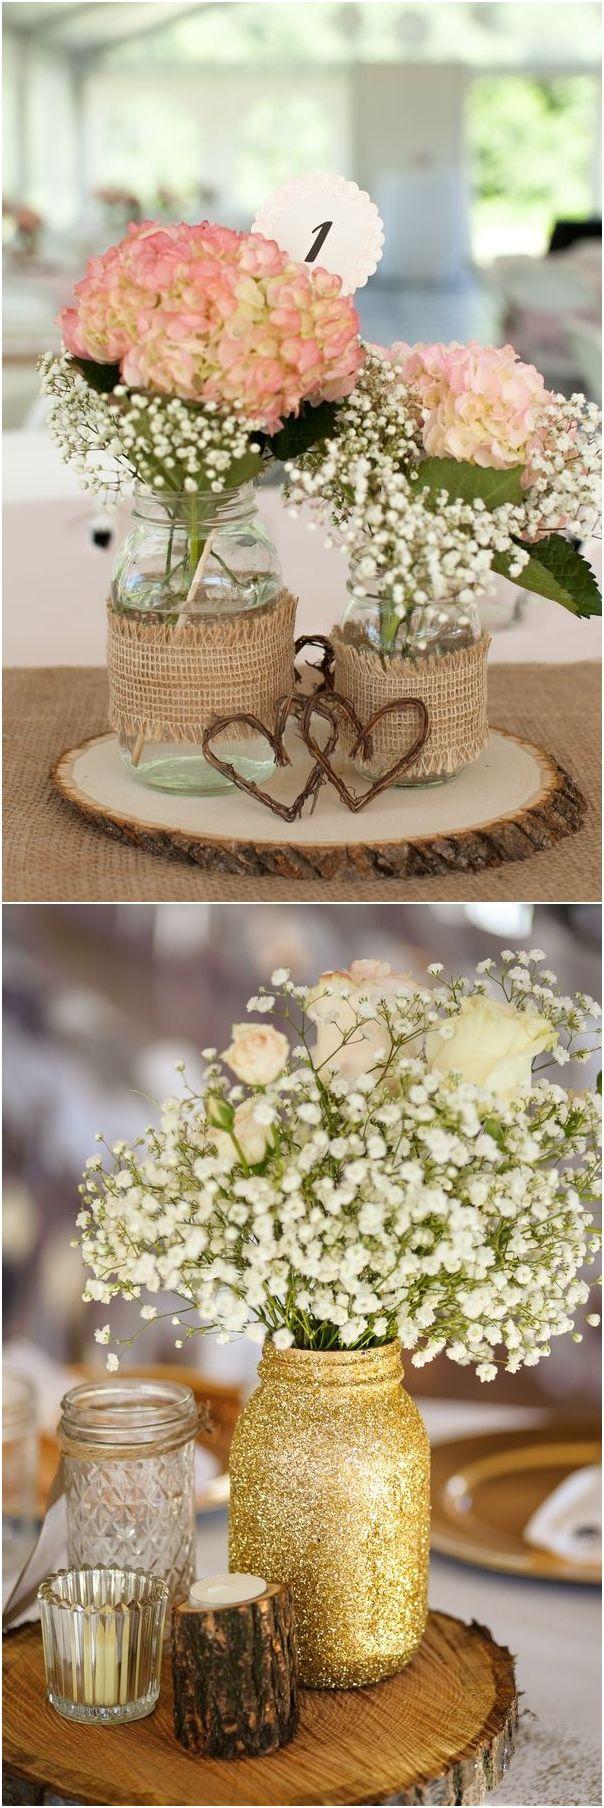 60 Insanely Wedding Centerpiece Ideas You\'ll Love | Centerpiece ...